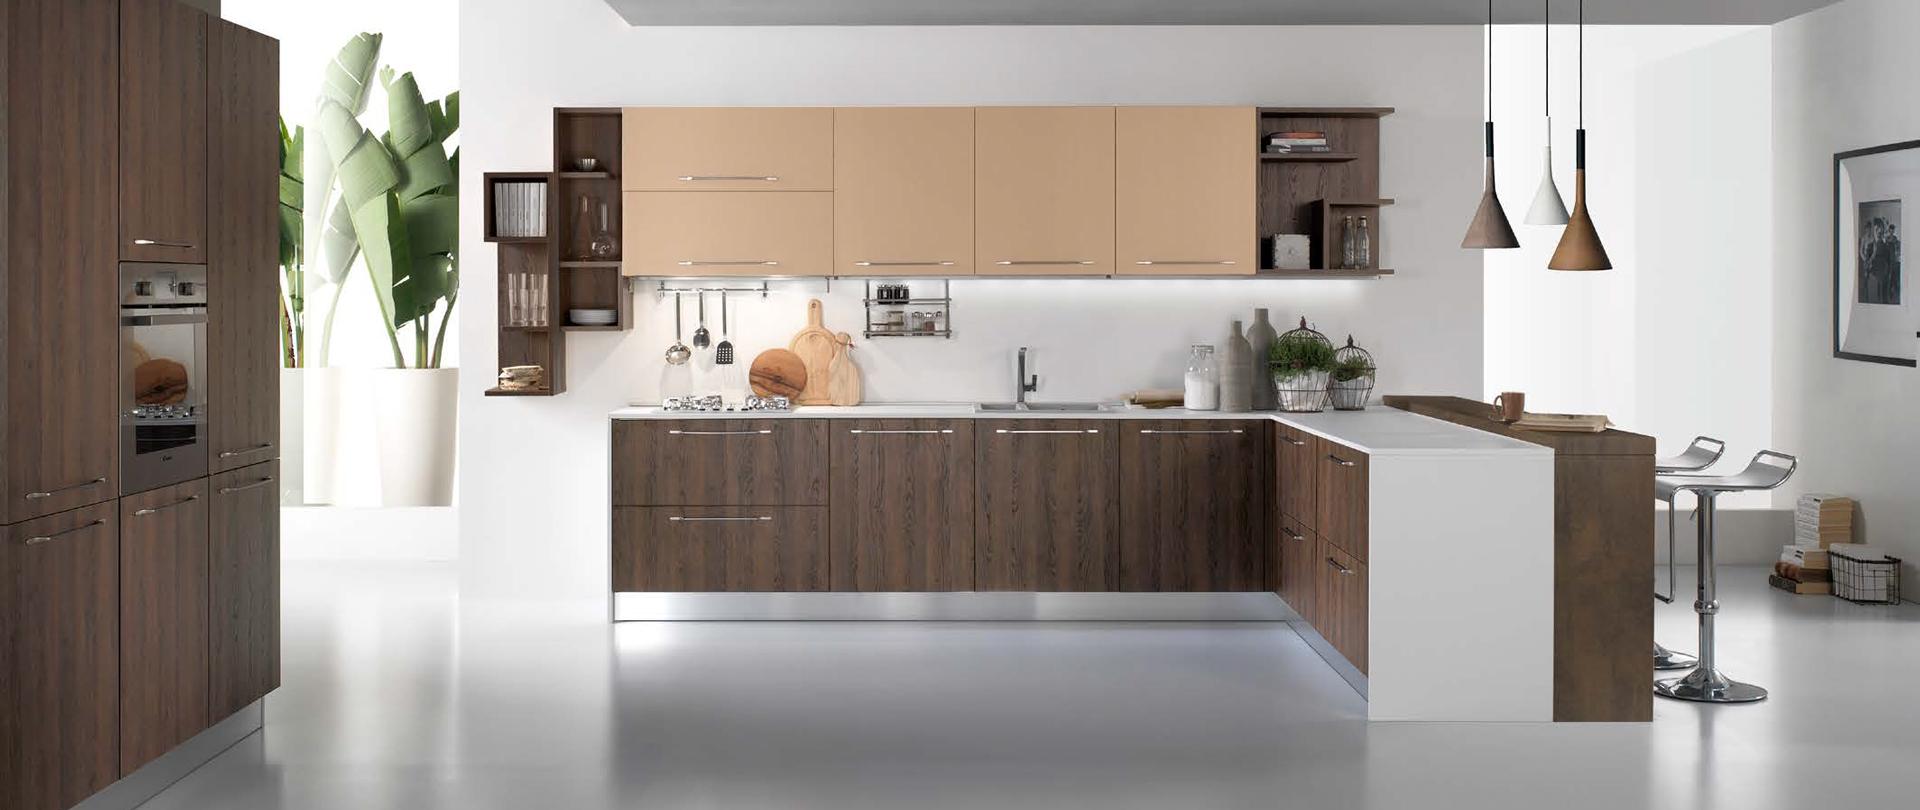 Qualit cucine trendy cucina in legno massello colore noce for Cucine pertinger